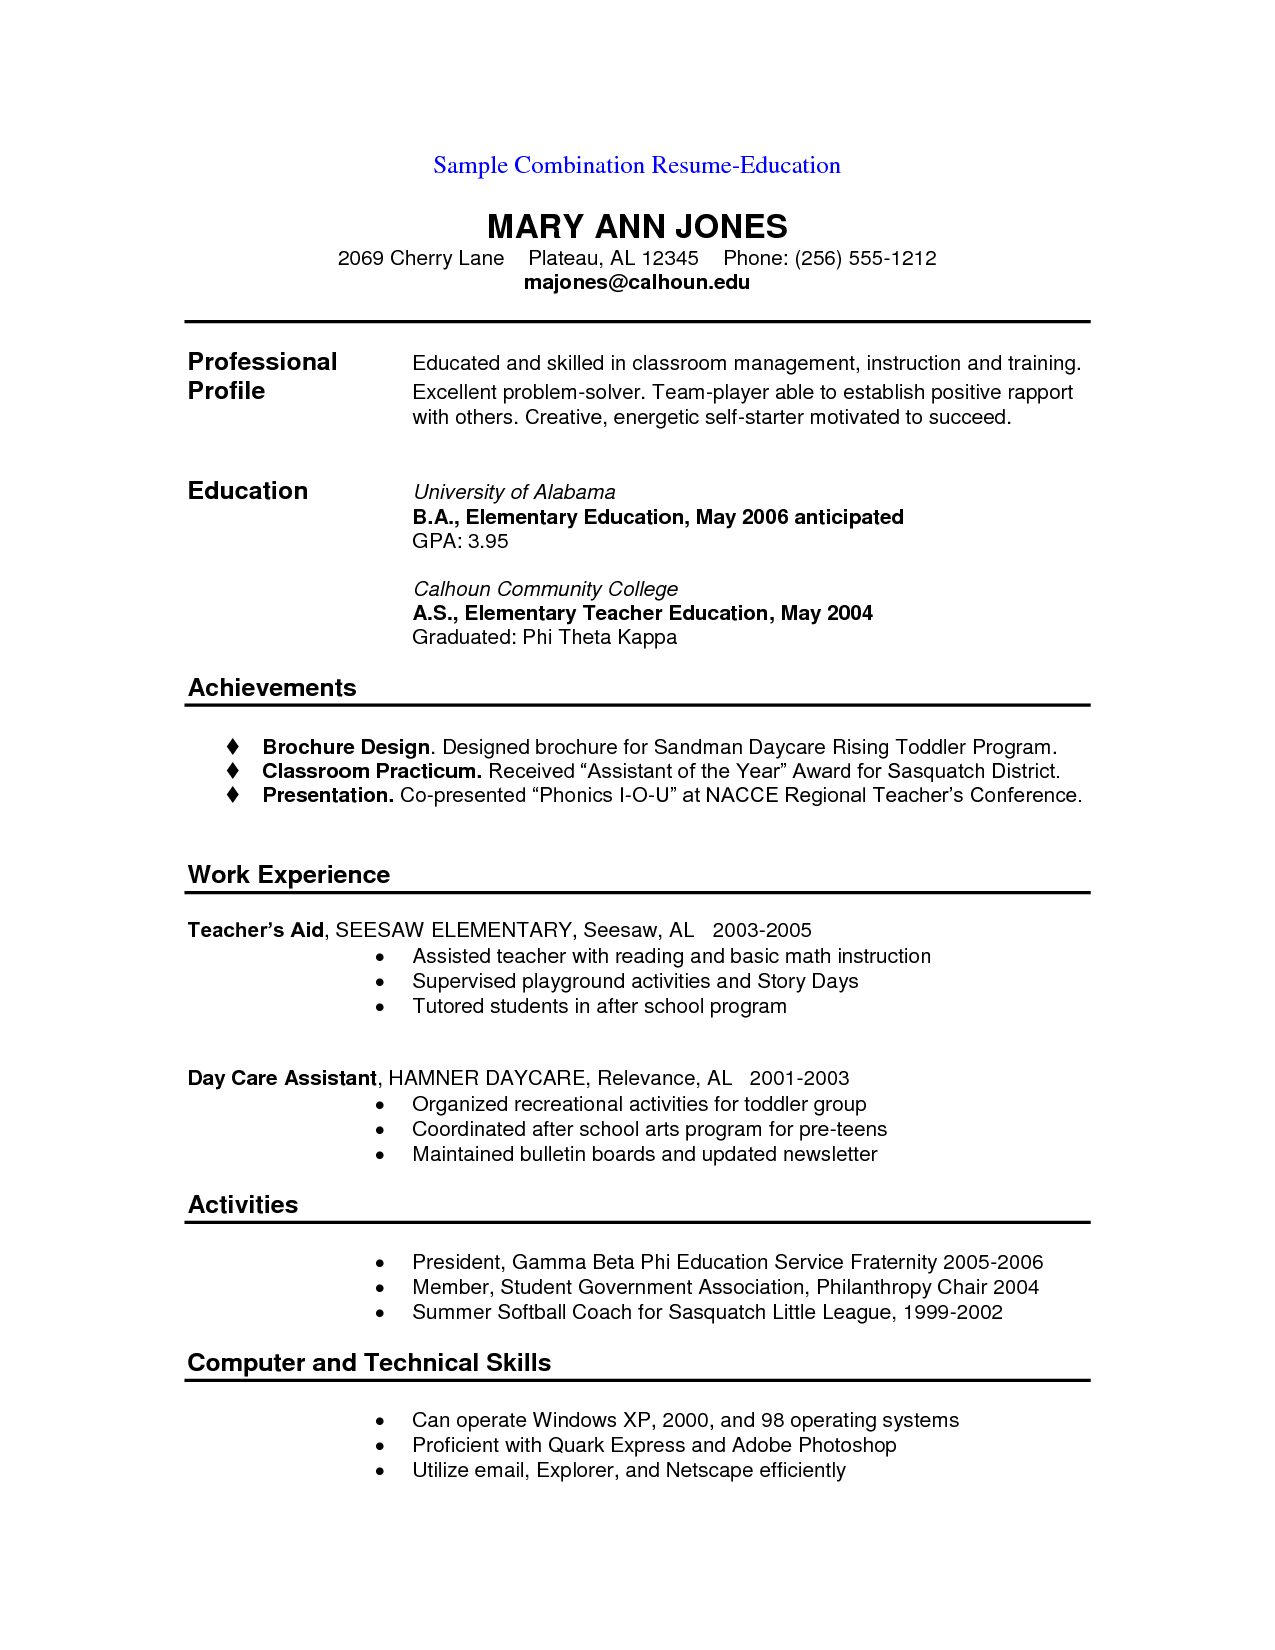 resume format rules pinterest resume format